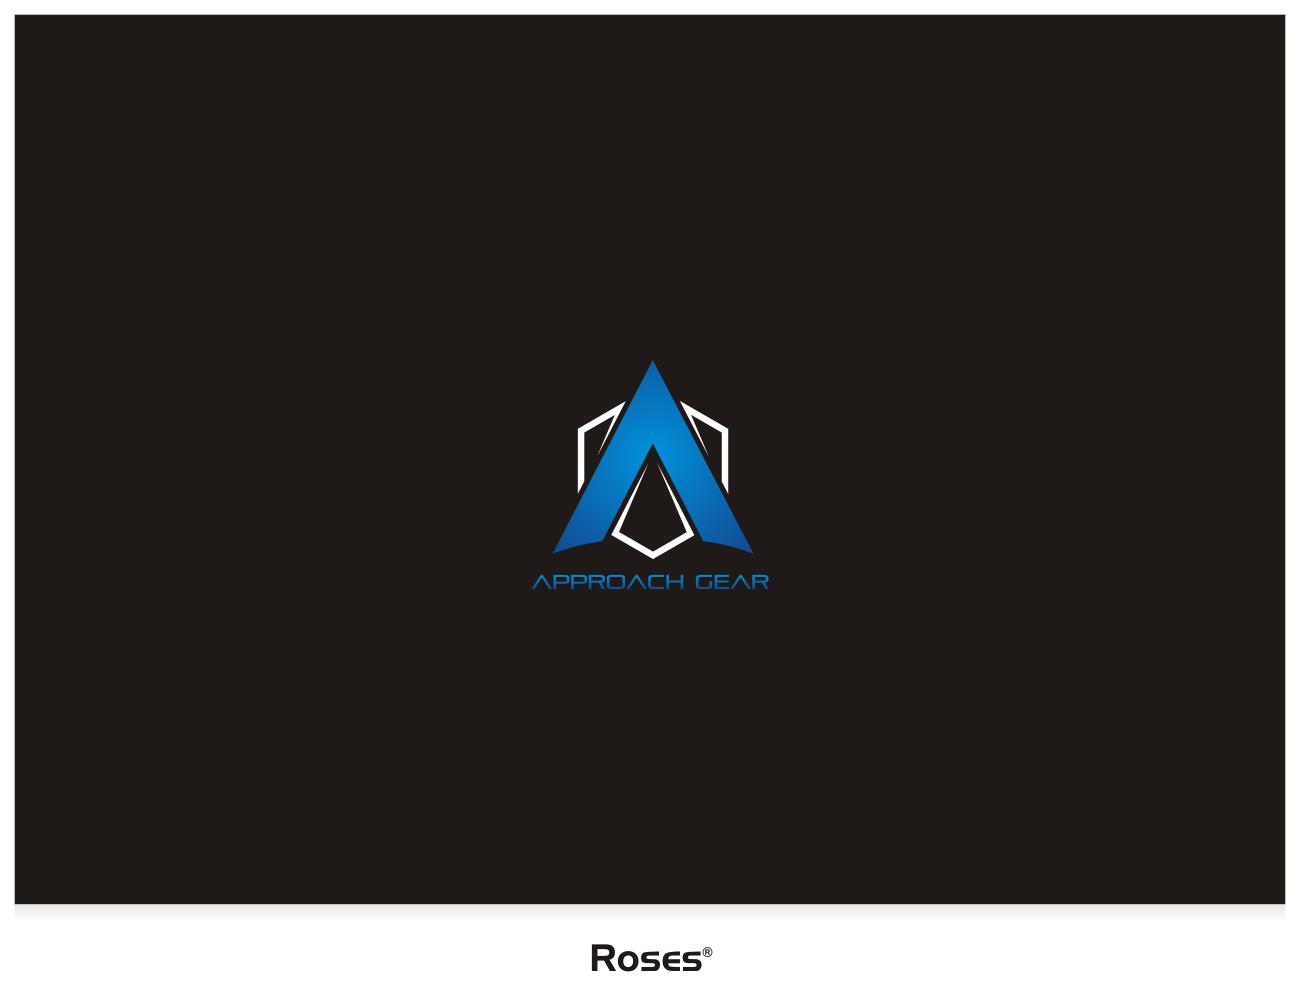 11 graphic design logo ideas images graphic design logo for Design logo gratis